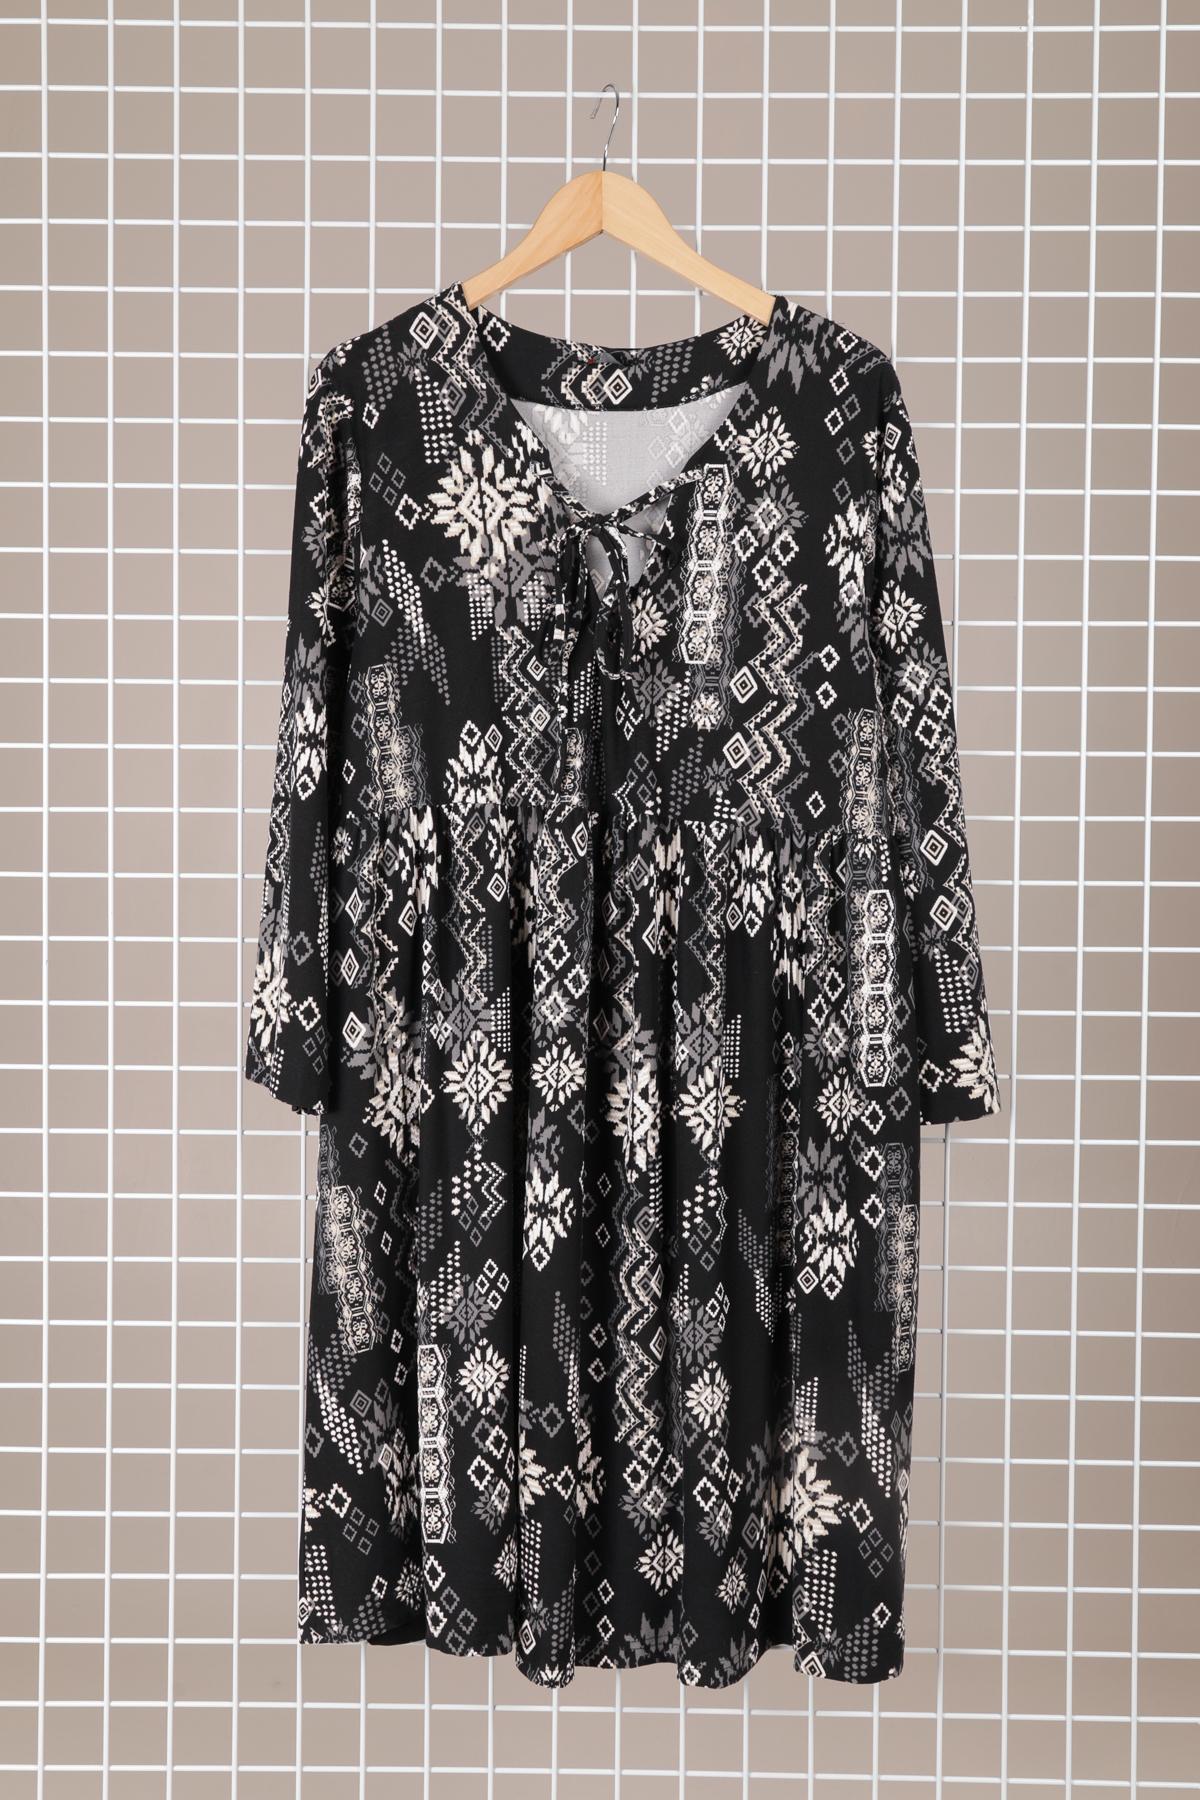 robe originale grande taille femme marque 2w paris noir h3500-2